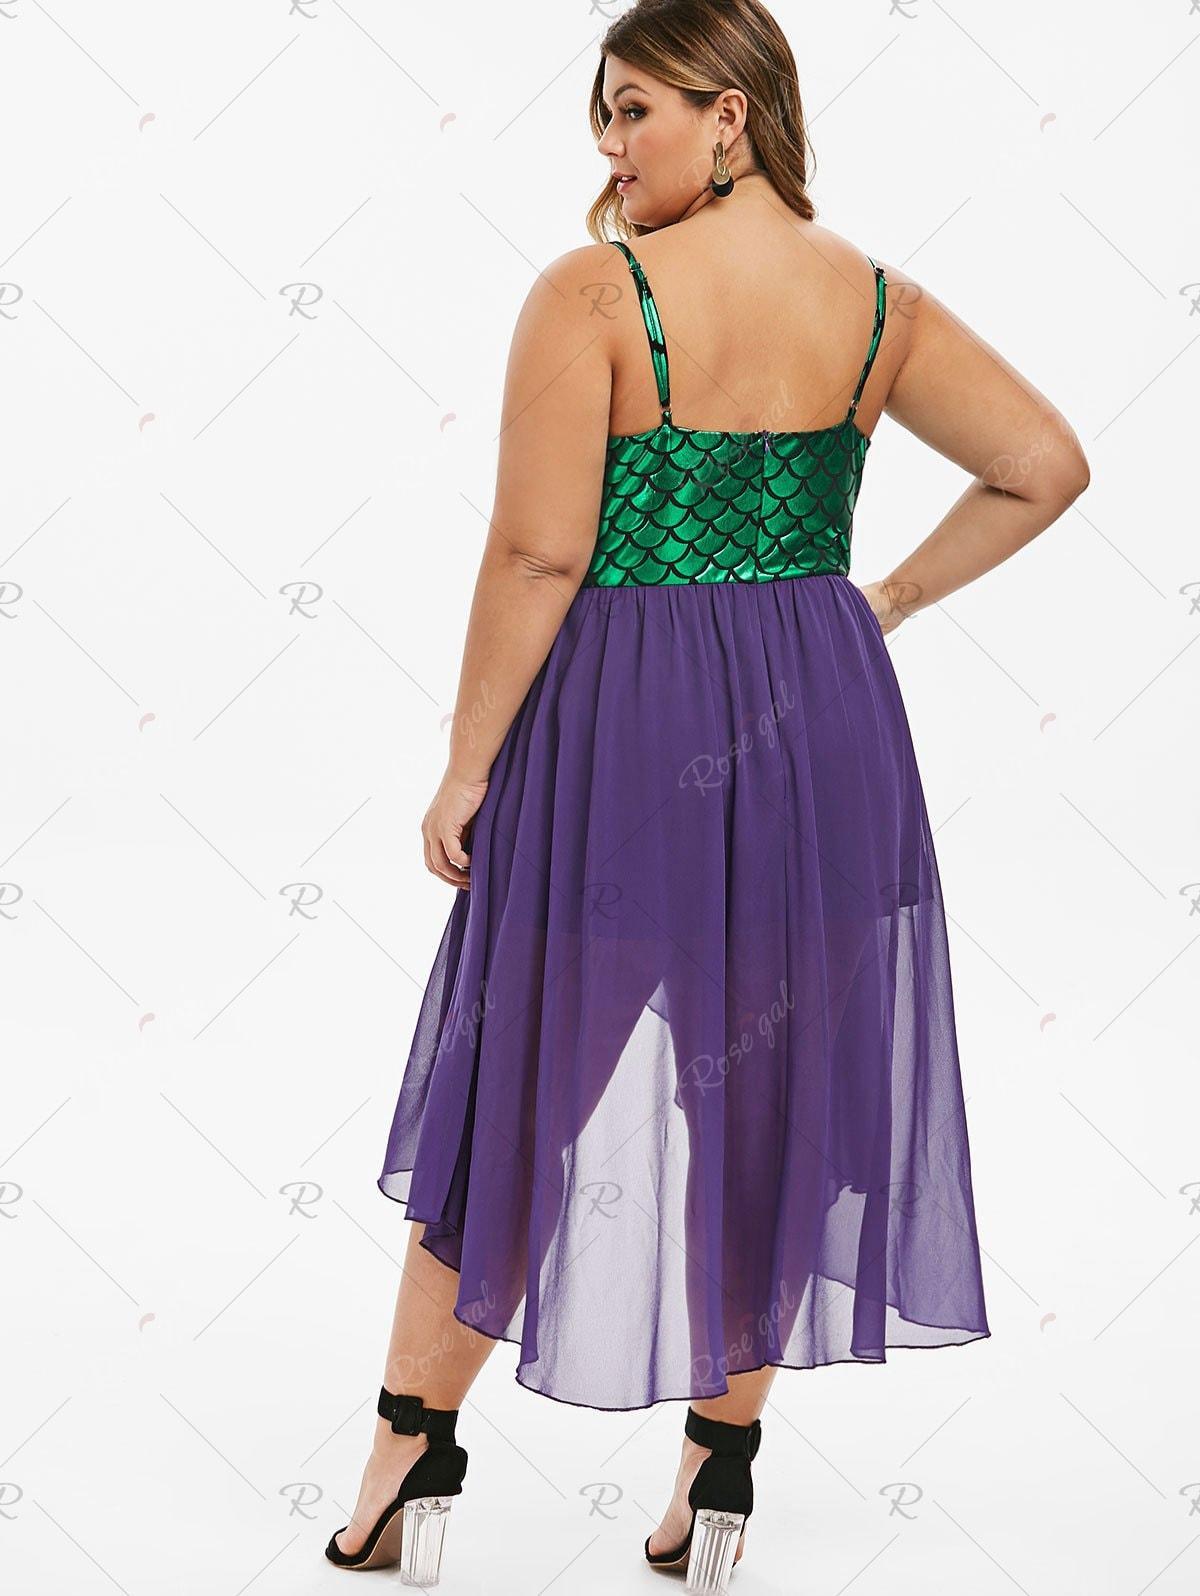 Overlap High Low Mermaid Scales Plus Size Dress